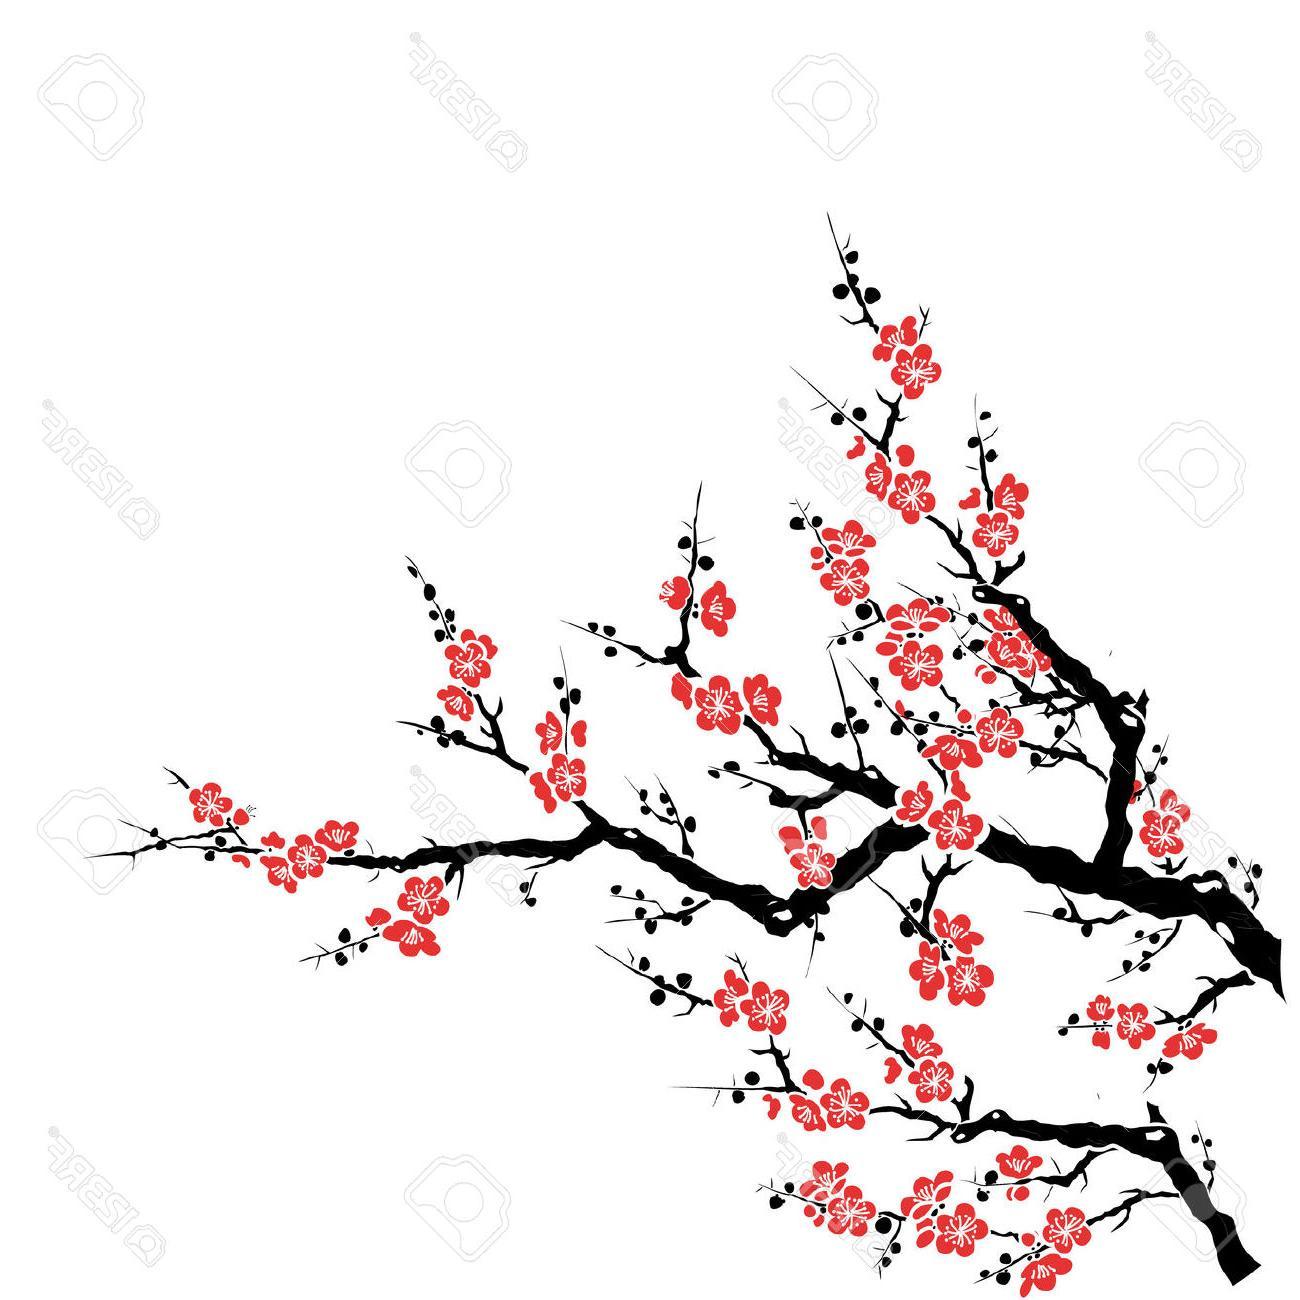 1300x1300 Sakura Flower Draw Top 10 Plum Tree Red Cherry Blossom Drawing